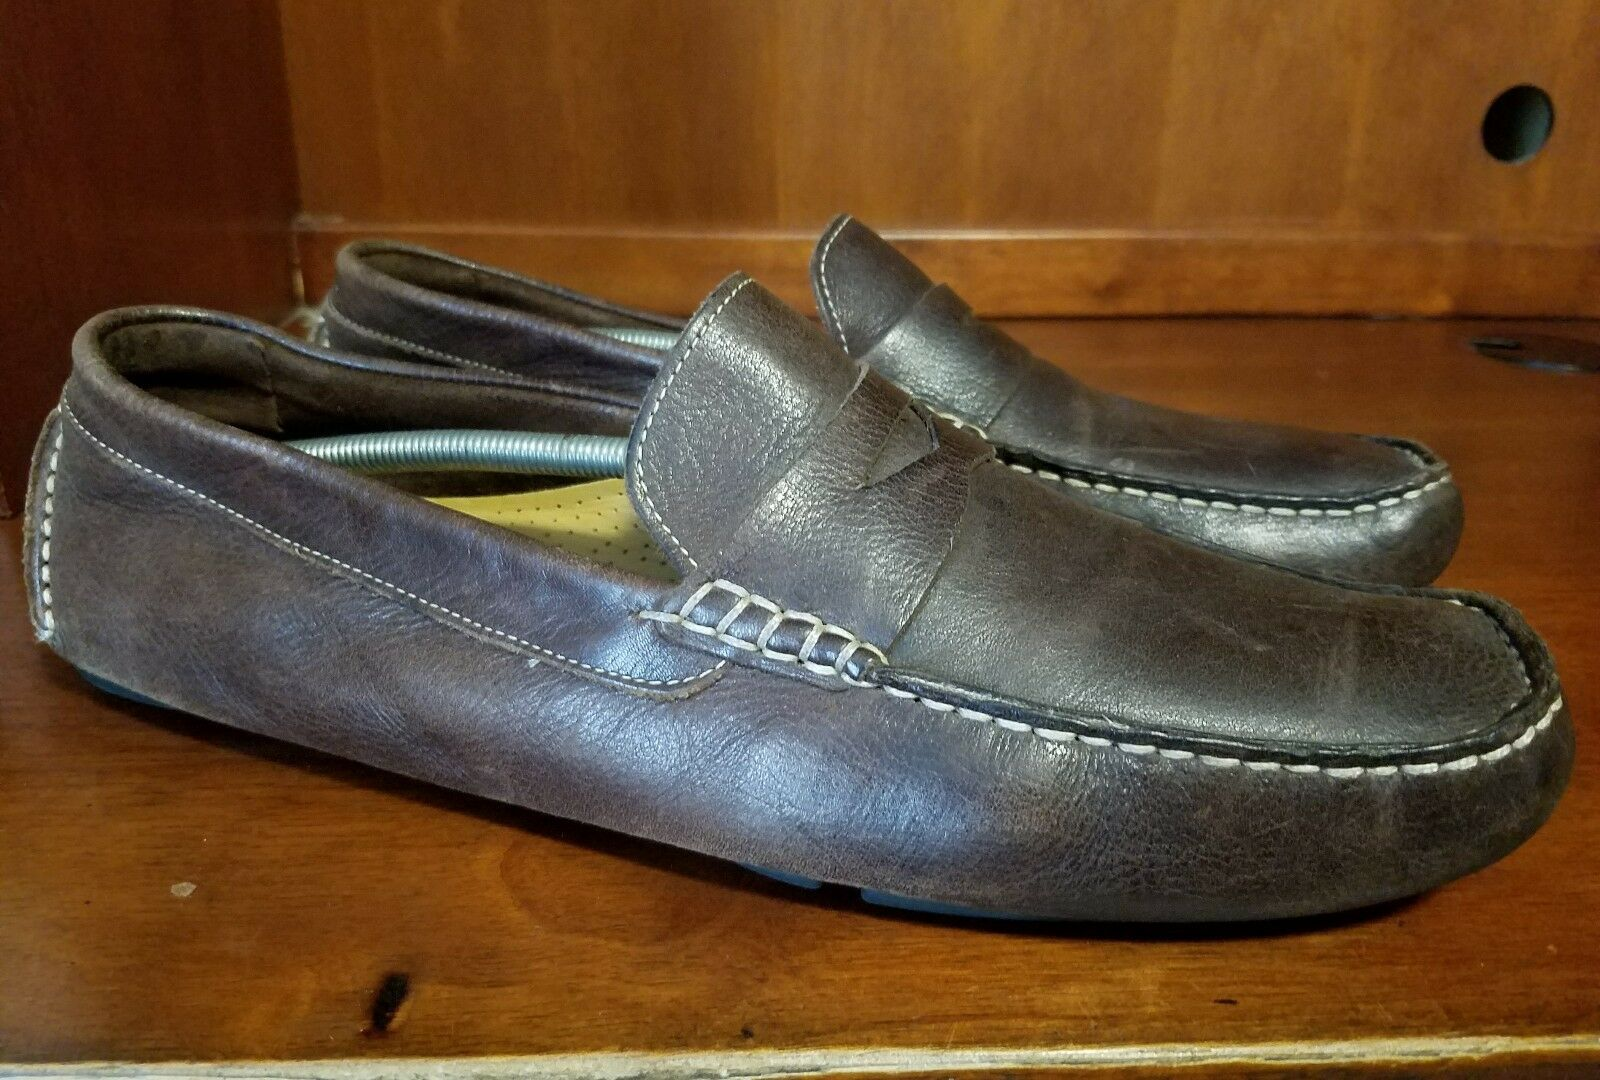 Cole Haan Moccasins Men Distress Braun Leder Driving Loafers Moccasins Haan Größe 11.5 M 310f27